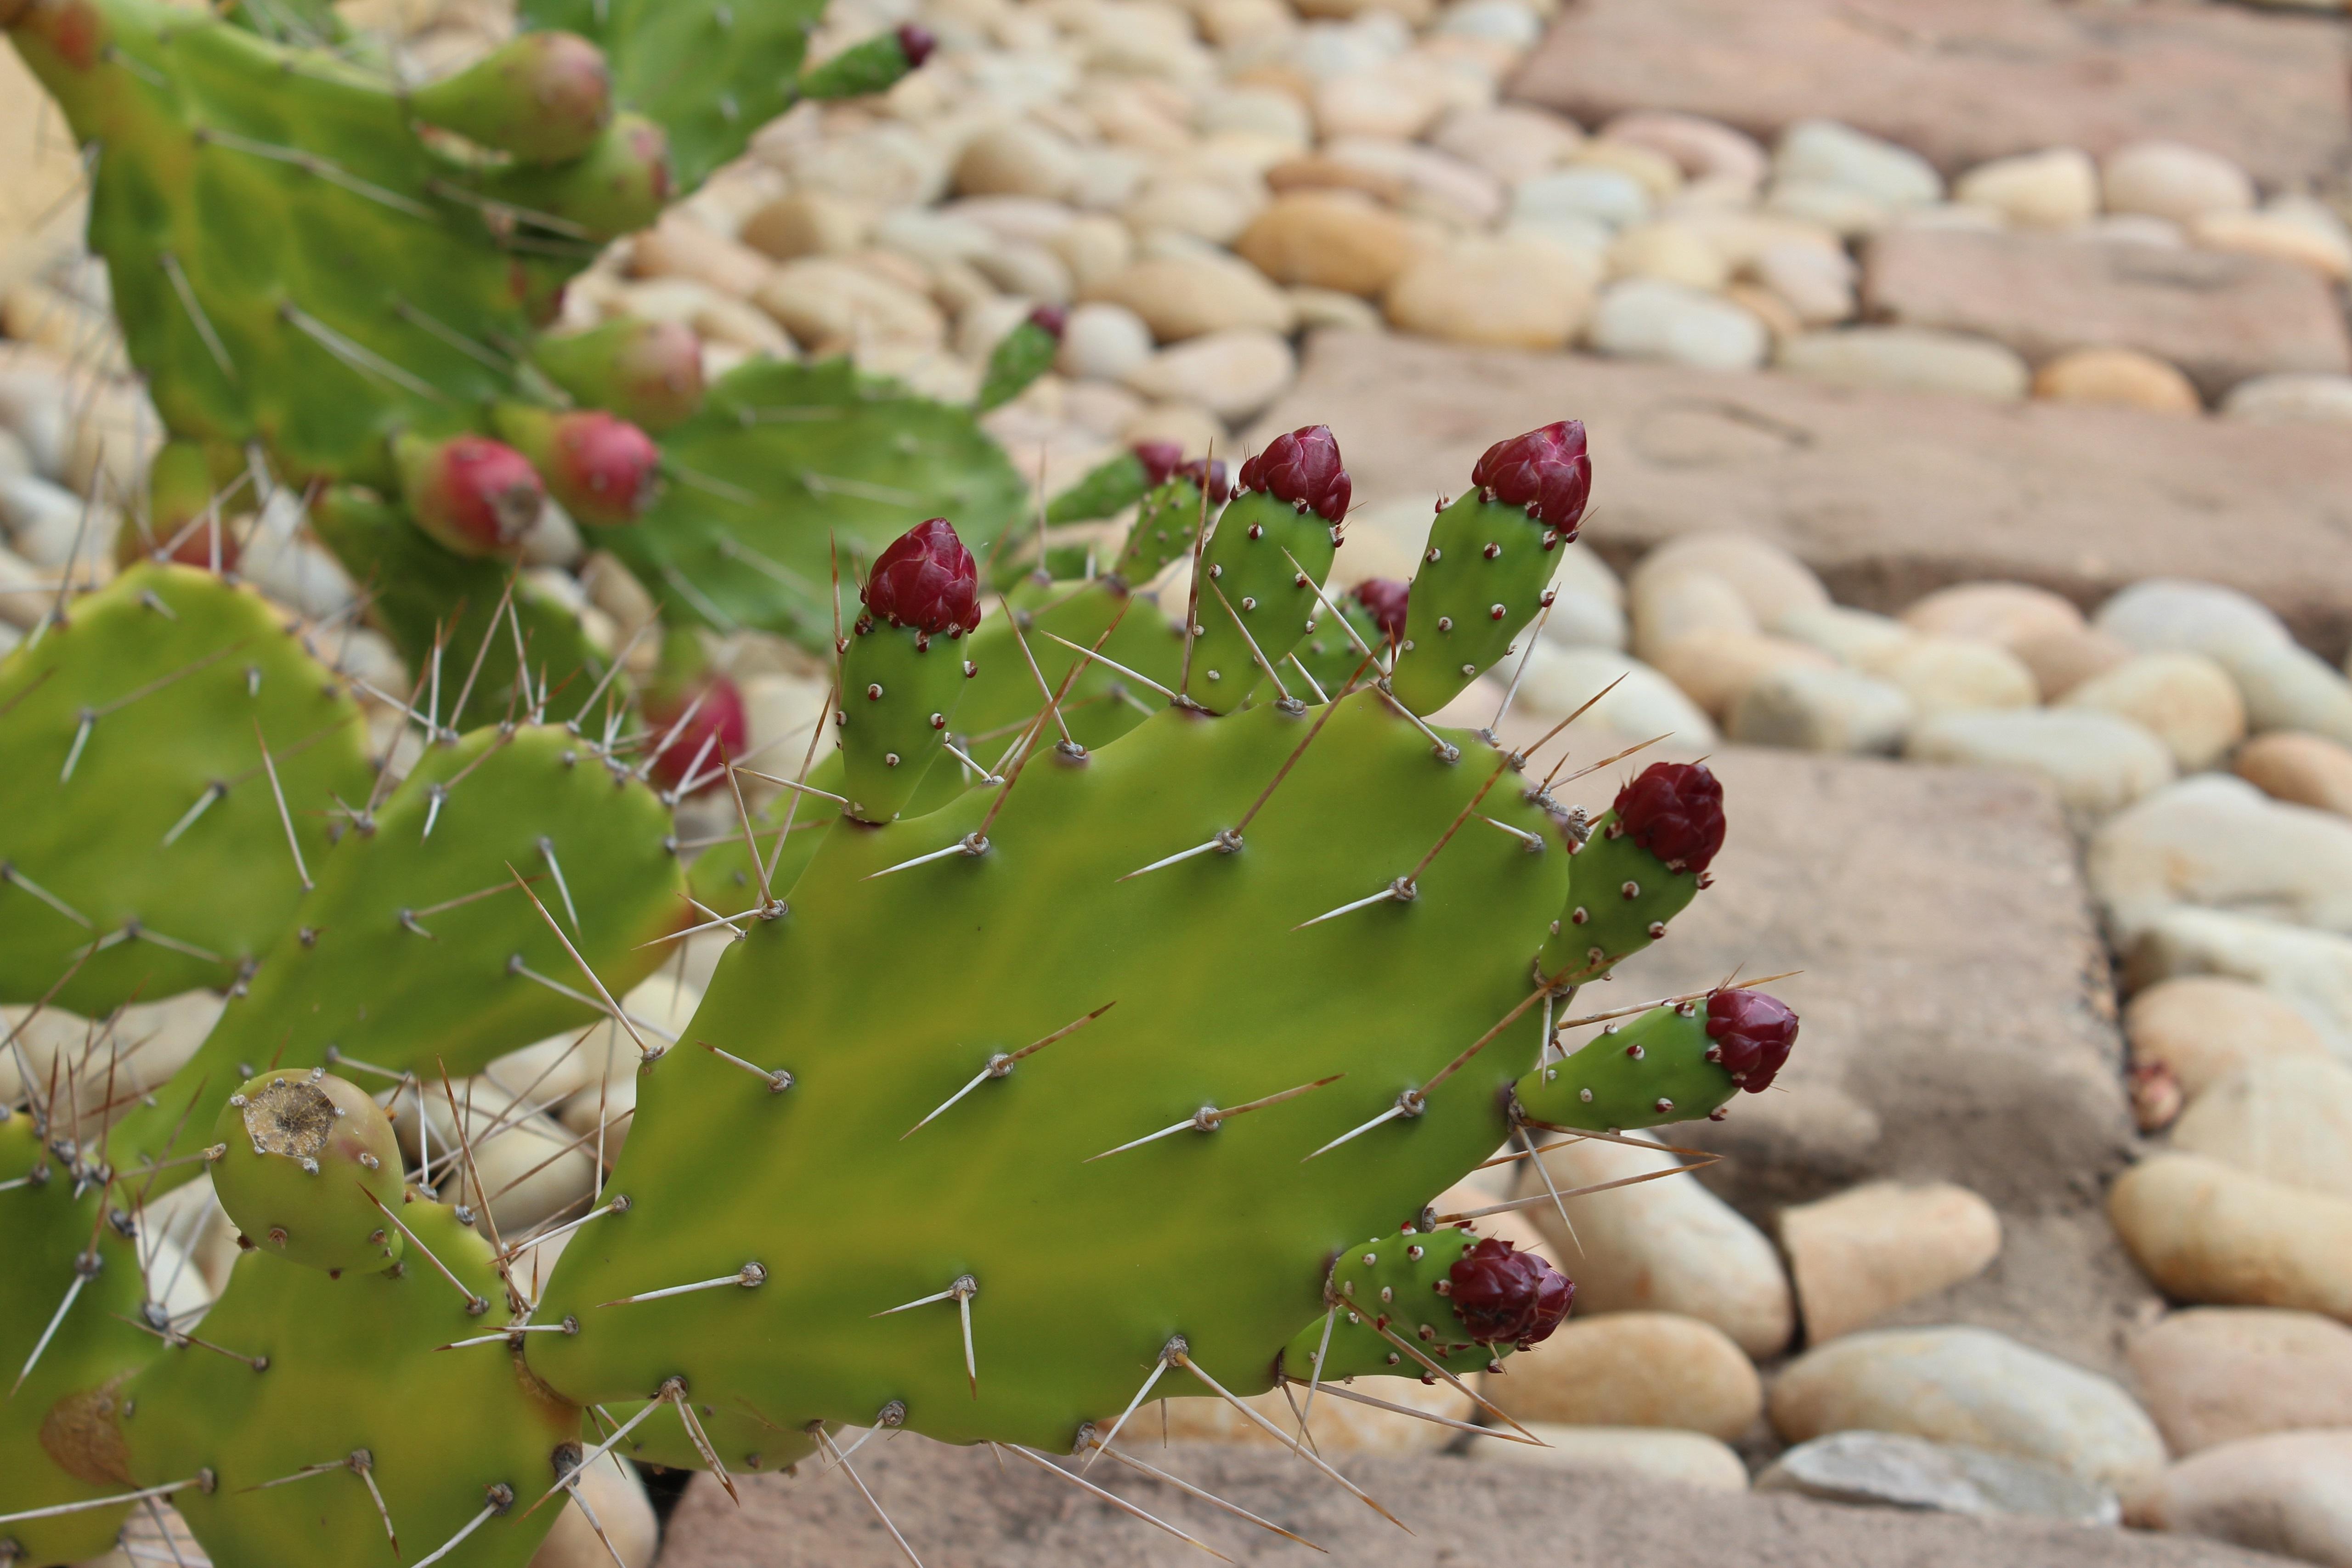 cactus flowers wallpaper 4k 5k background